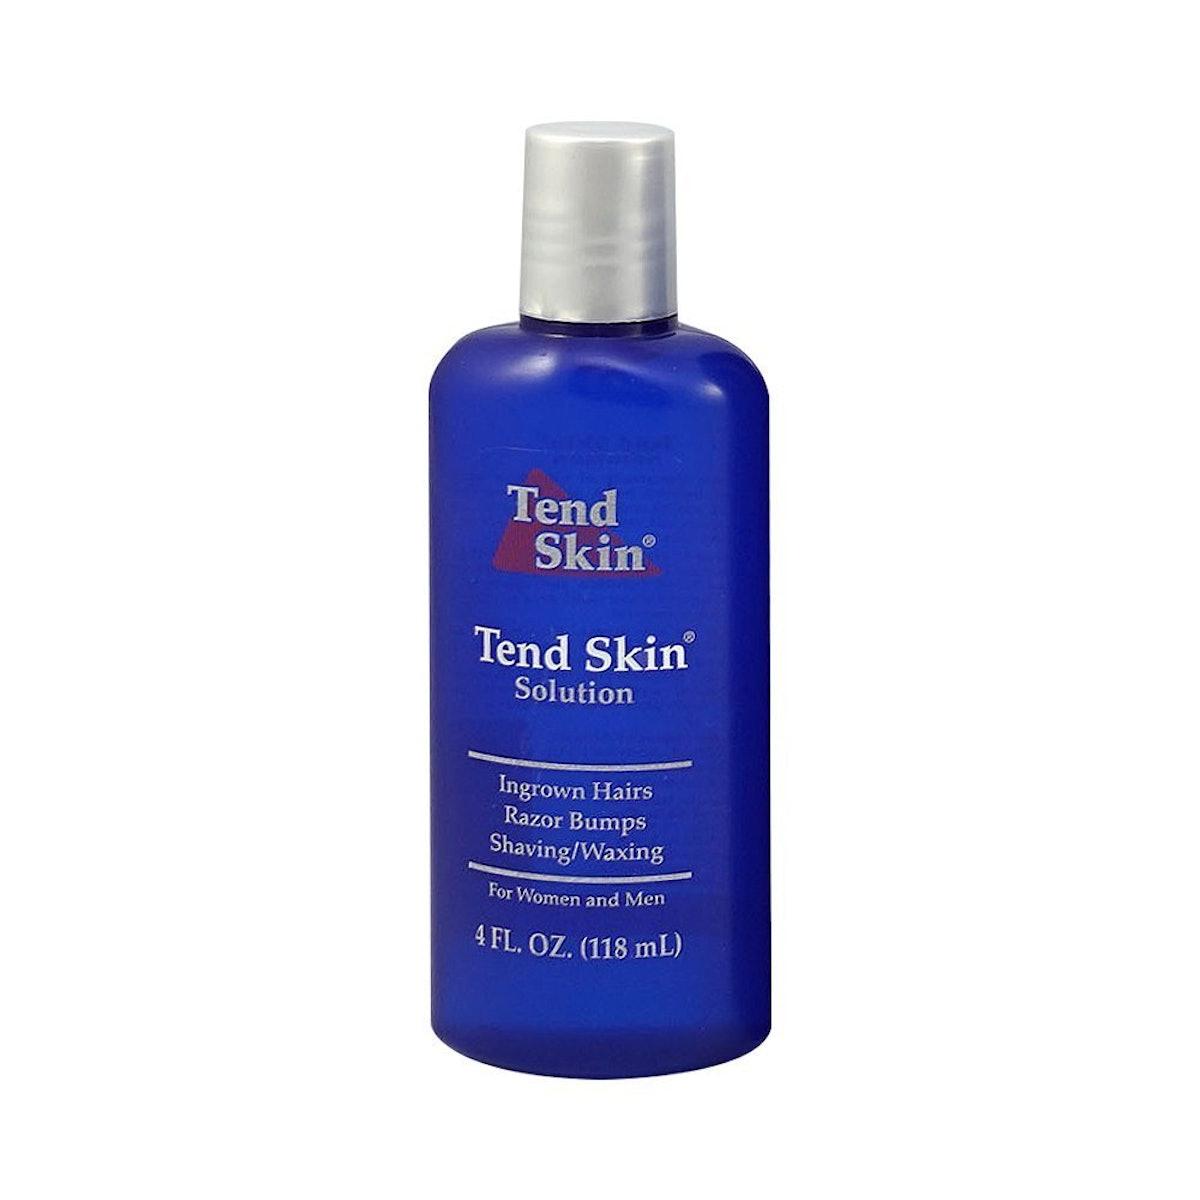 Tend Skin Solution For Razor Bumps